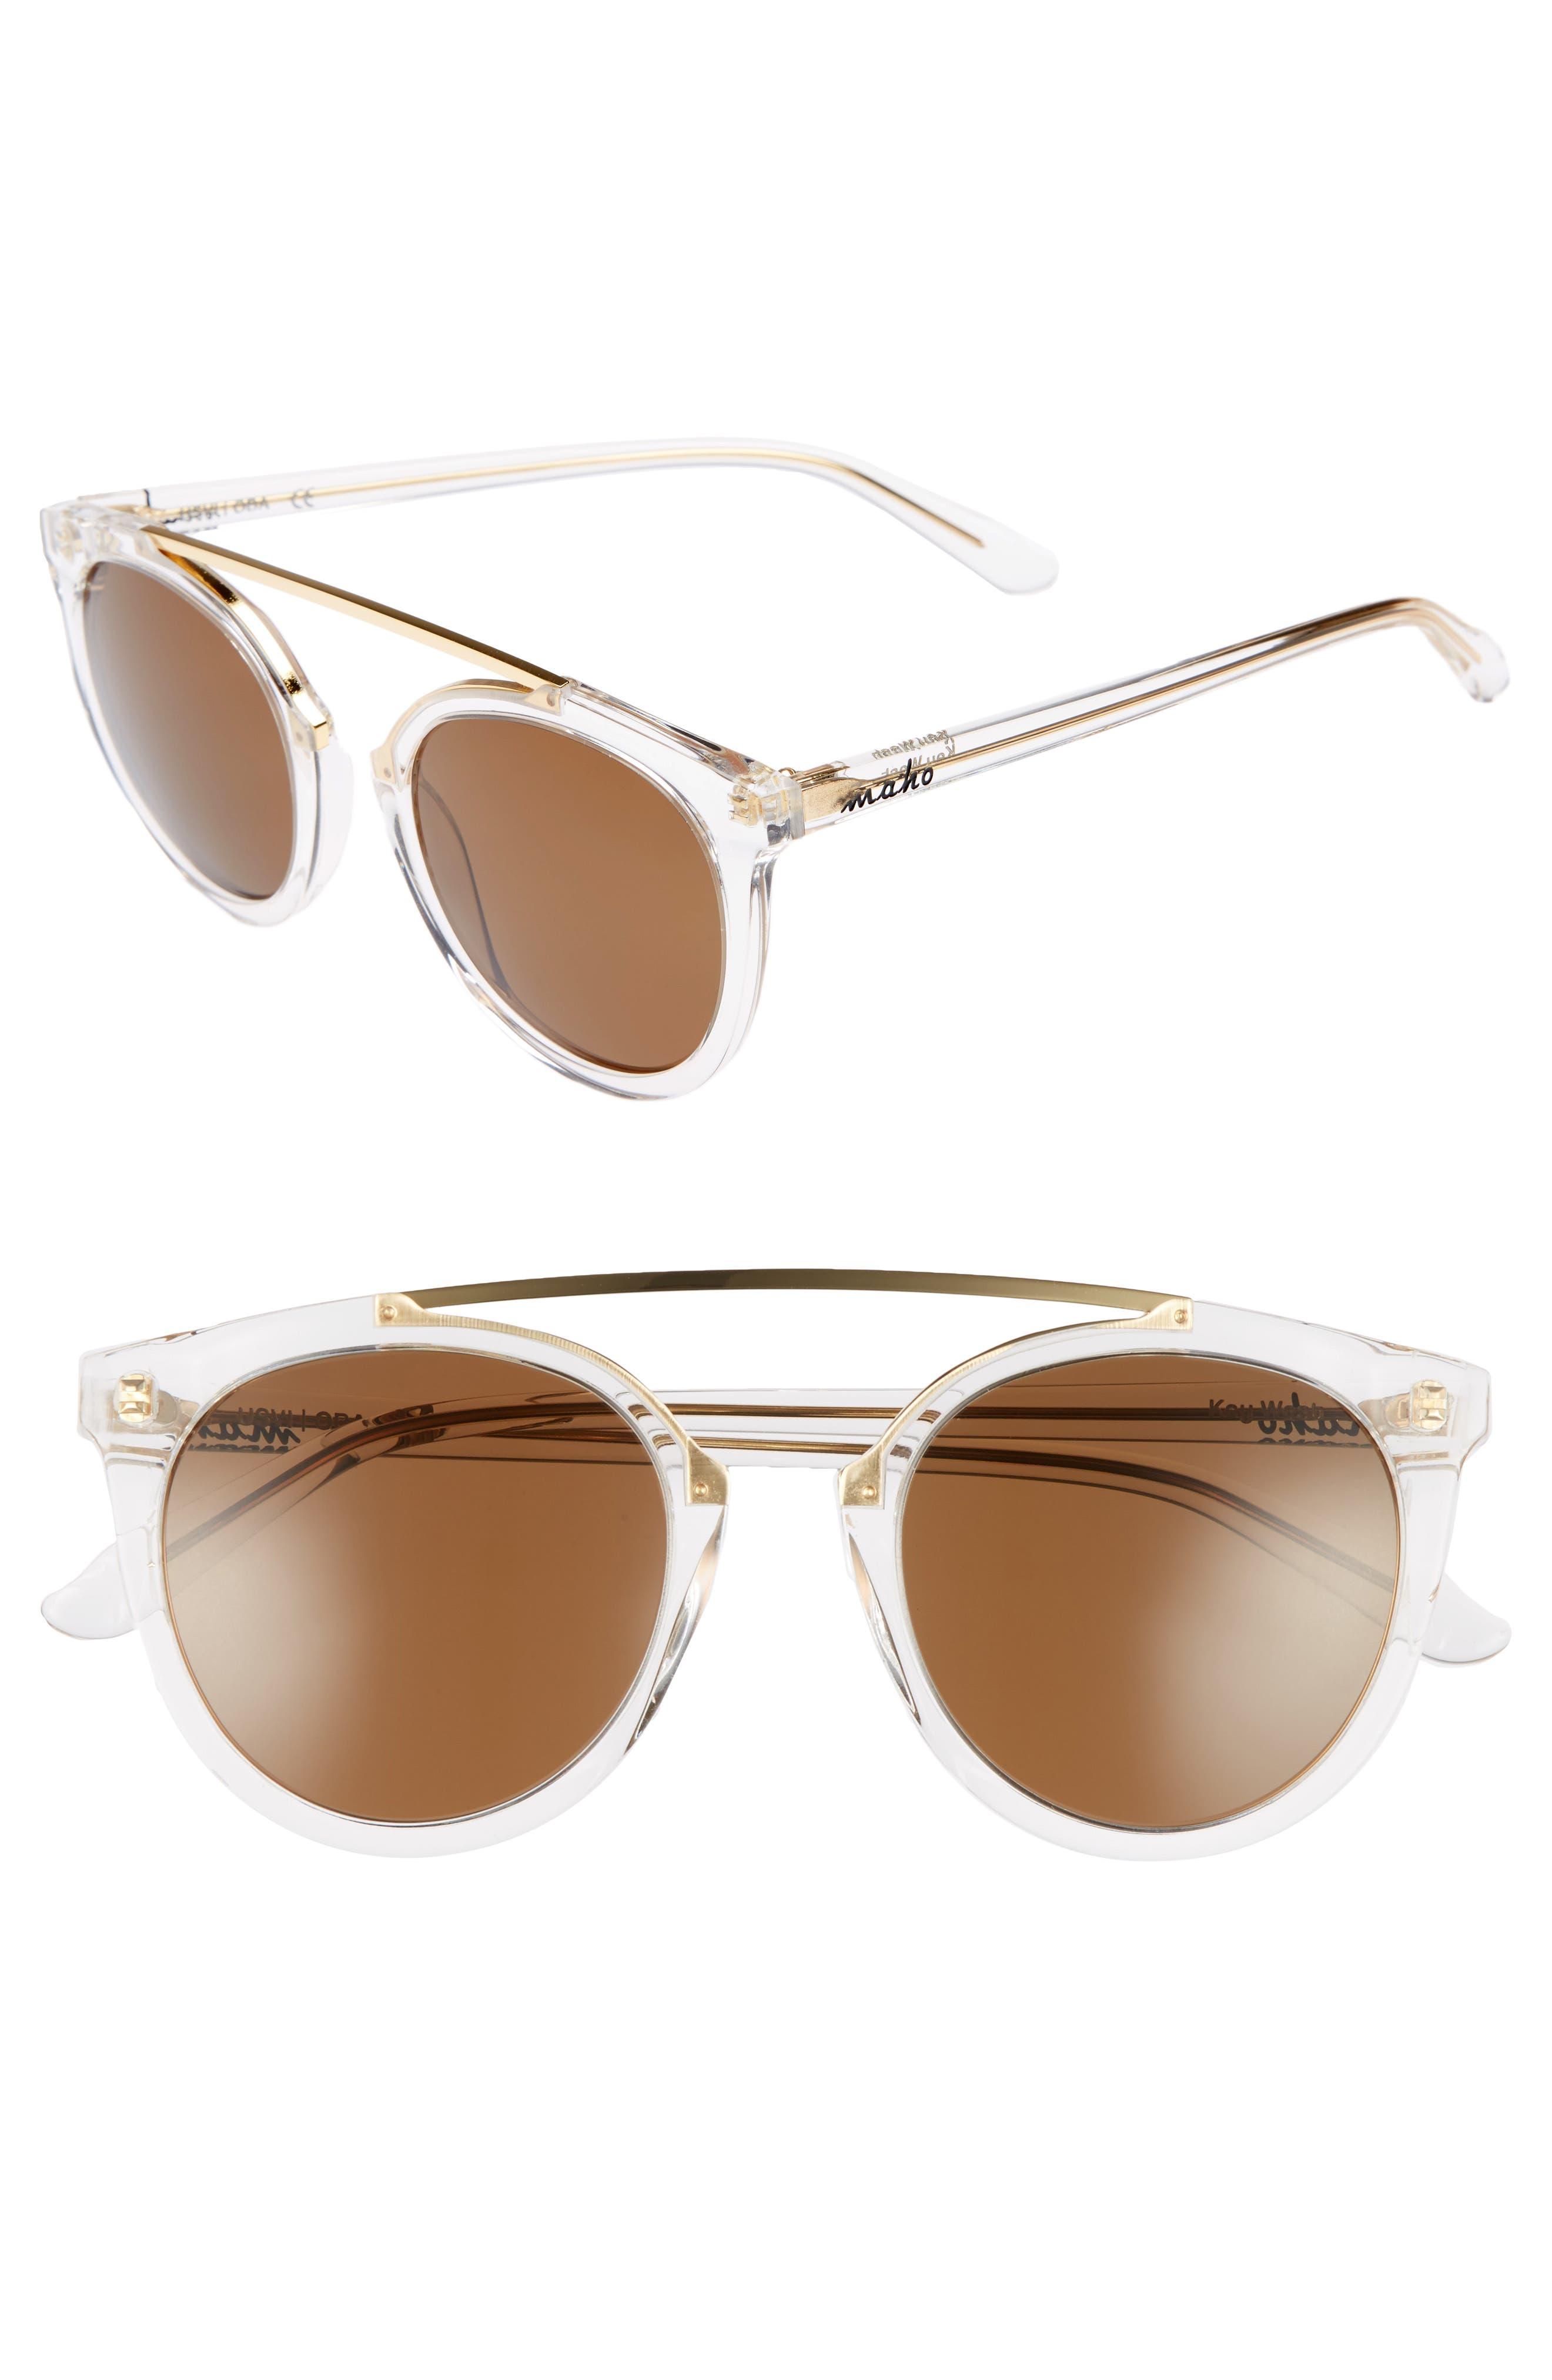 Main Image - Maho Key West 50mm Polarized Aviator Sunglasses